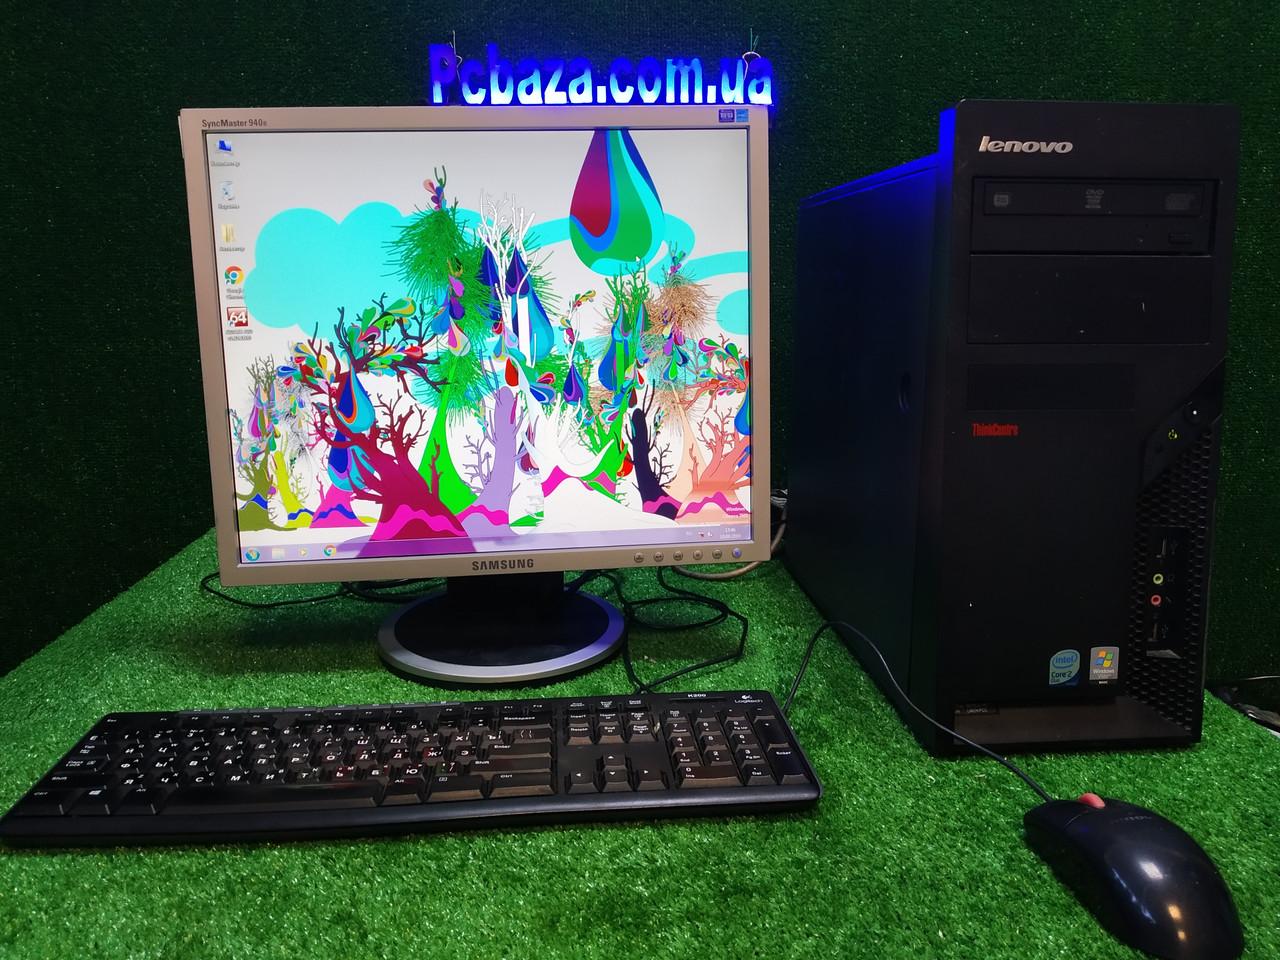 "Комплект настроенный Lenovo, 4 ядра, 4 ГБ, 160 Гб HDD +монитор 19"" Samsung"